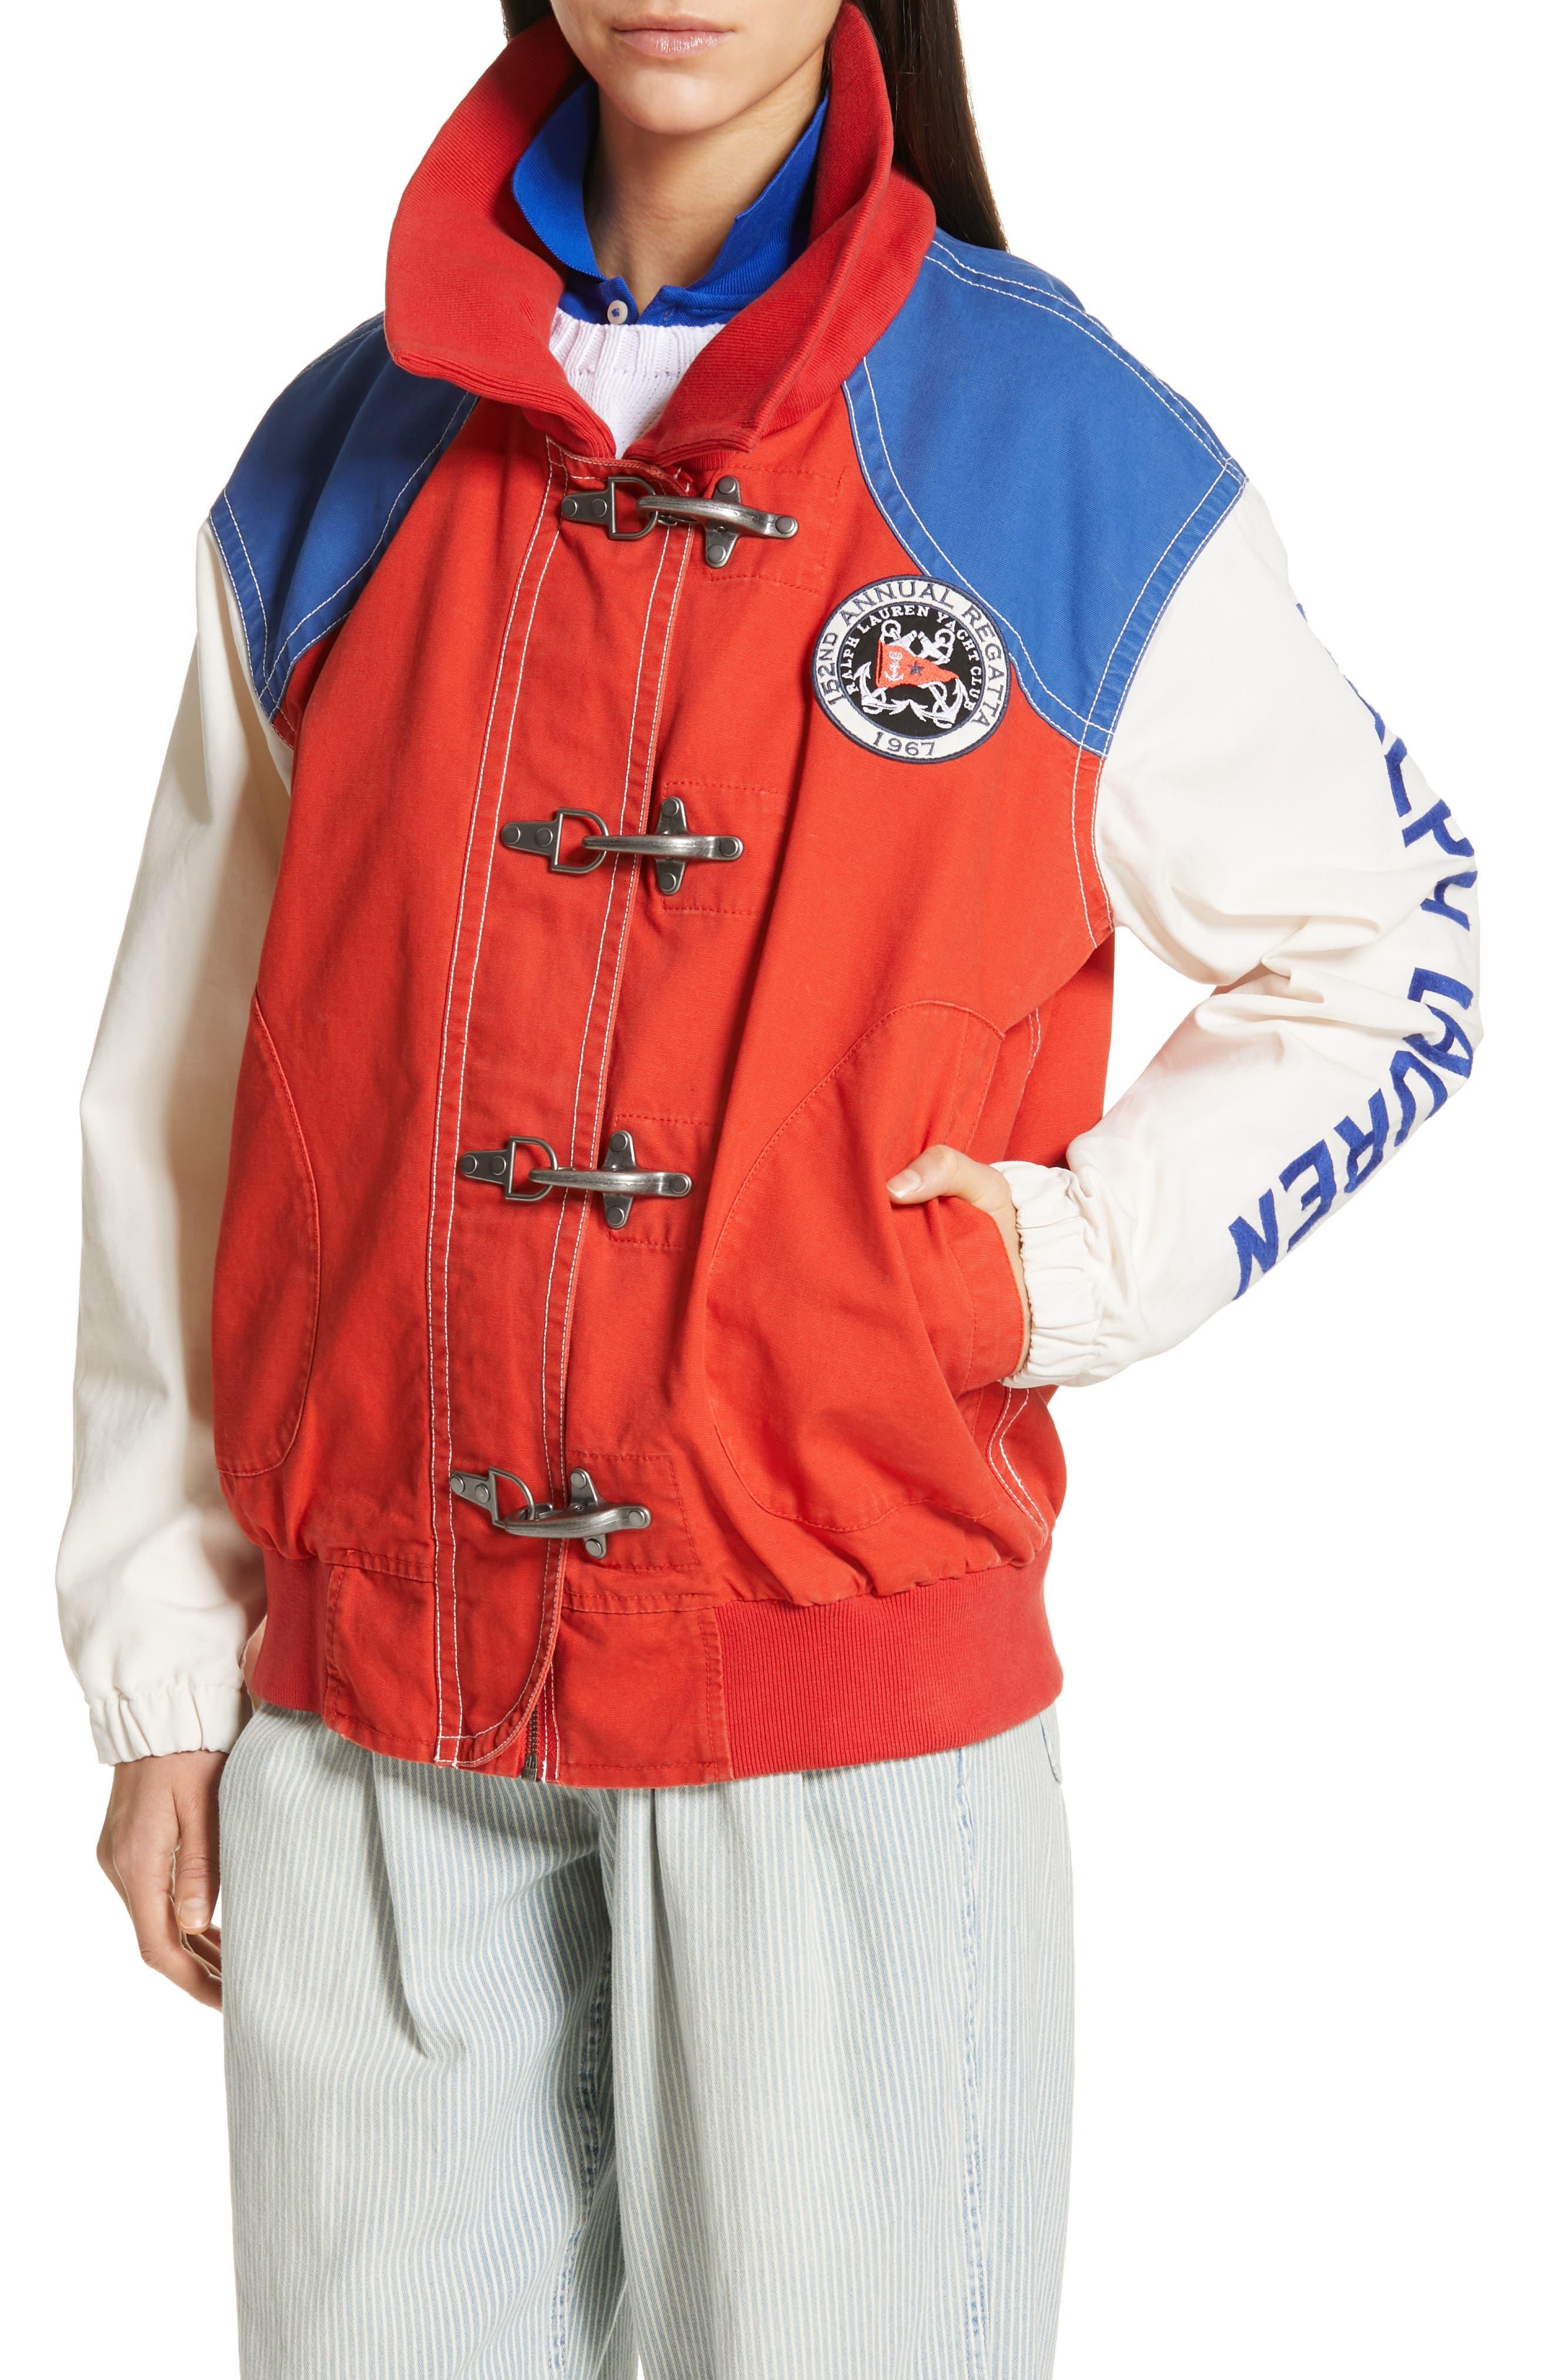 POLO RALPH LAUREN, Colorblock Utility Jacket, Alternate thumbnail 5, color, ORANGE/CREAM/ SAPPHIRE